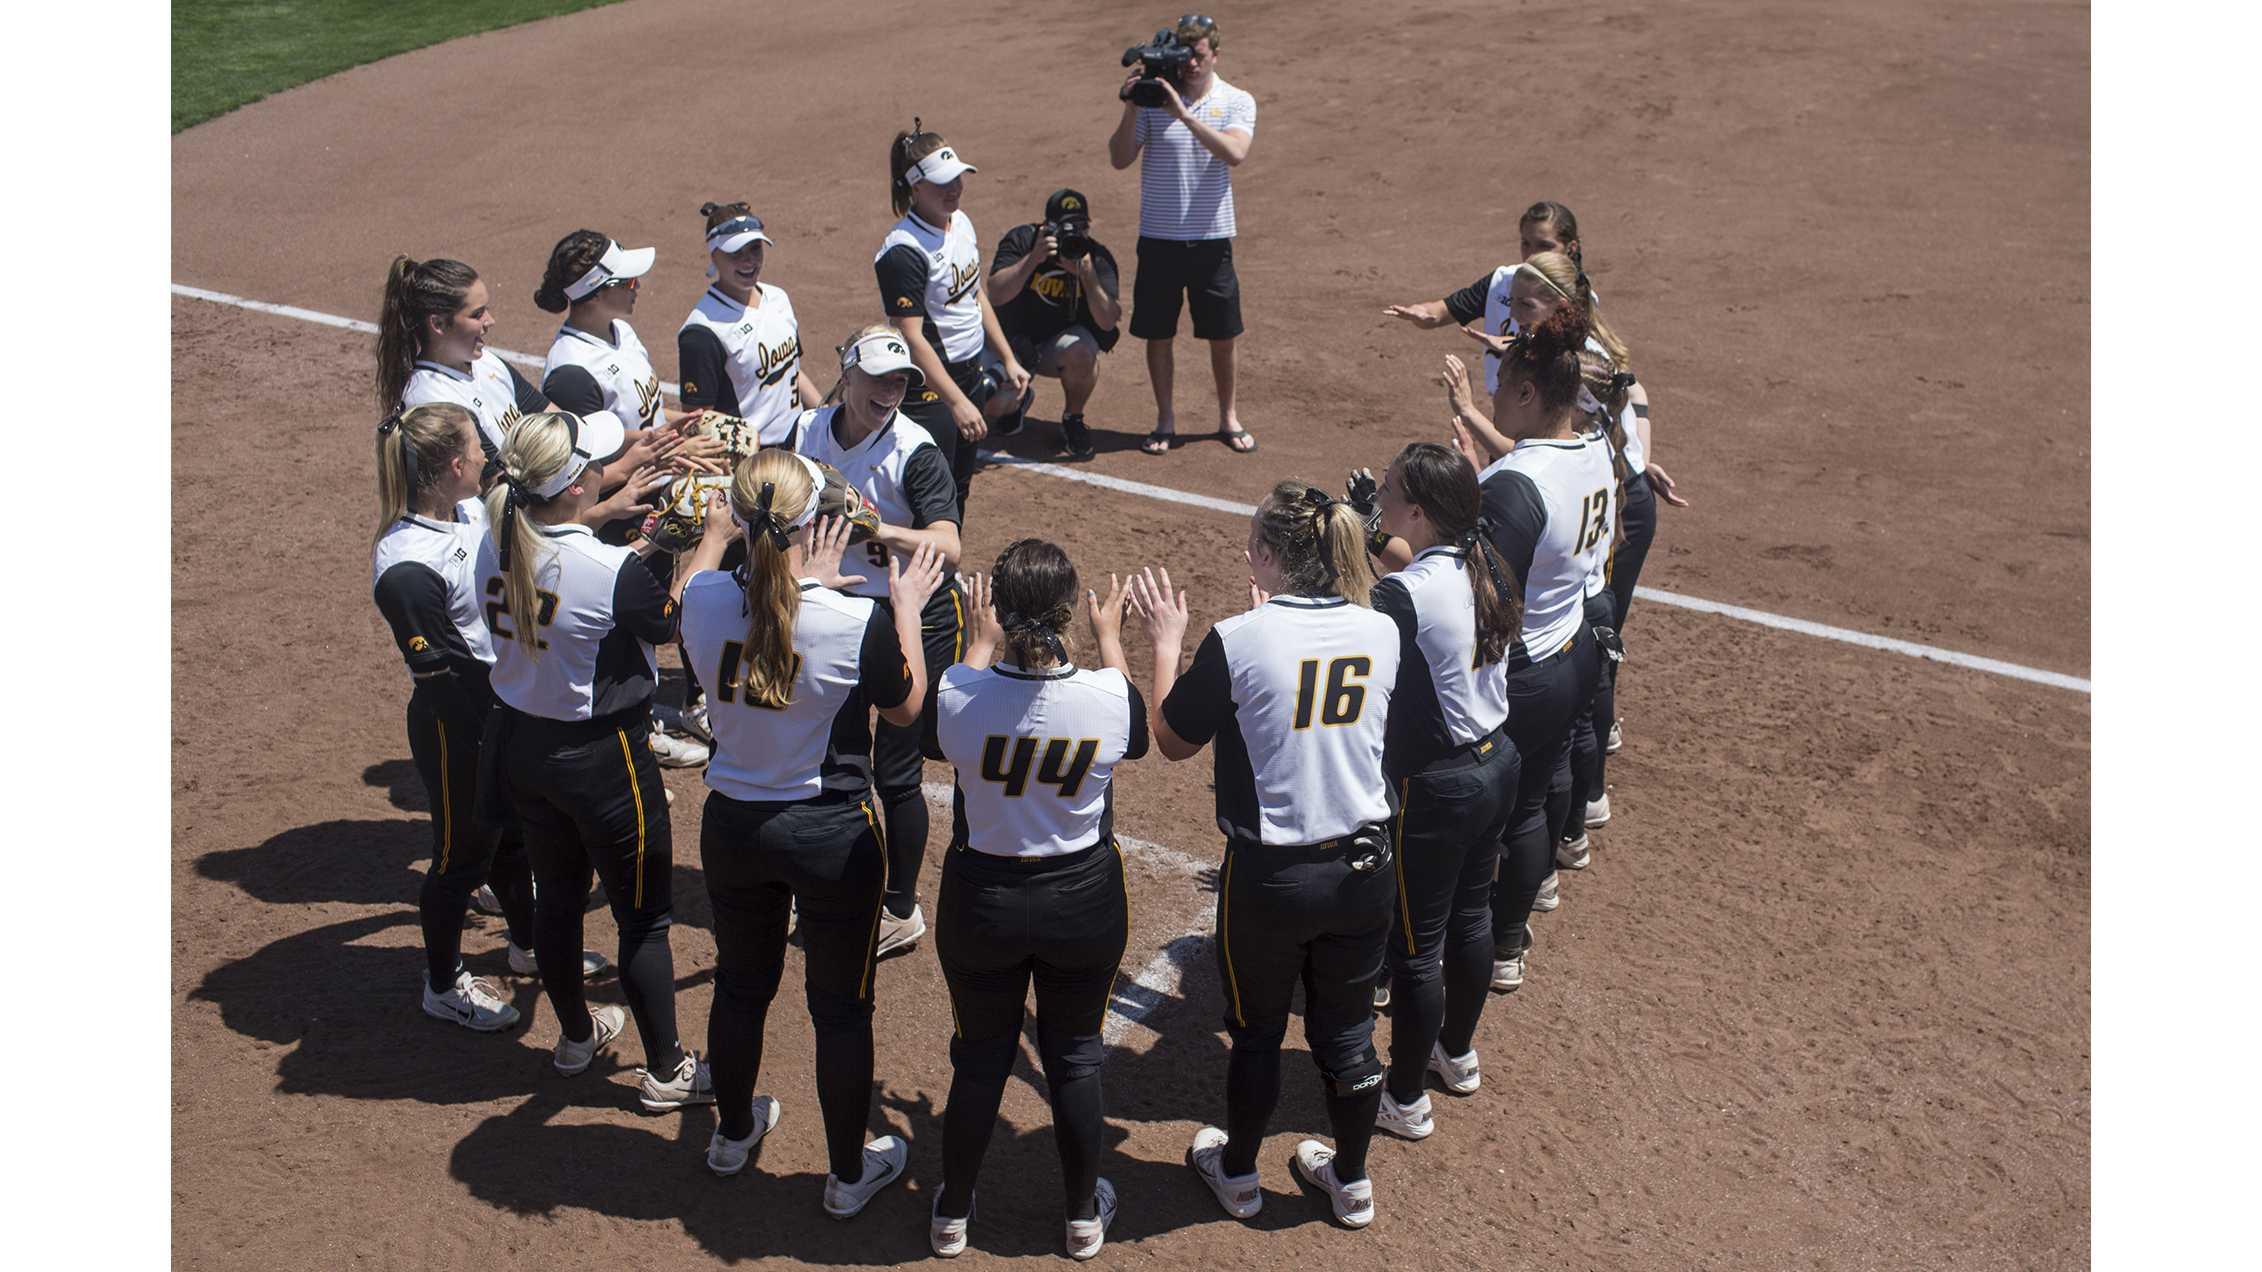 Photos: Iowa softball vs. Purdue (05/06/18)